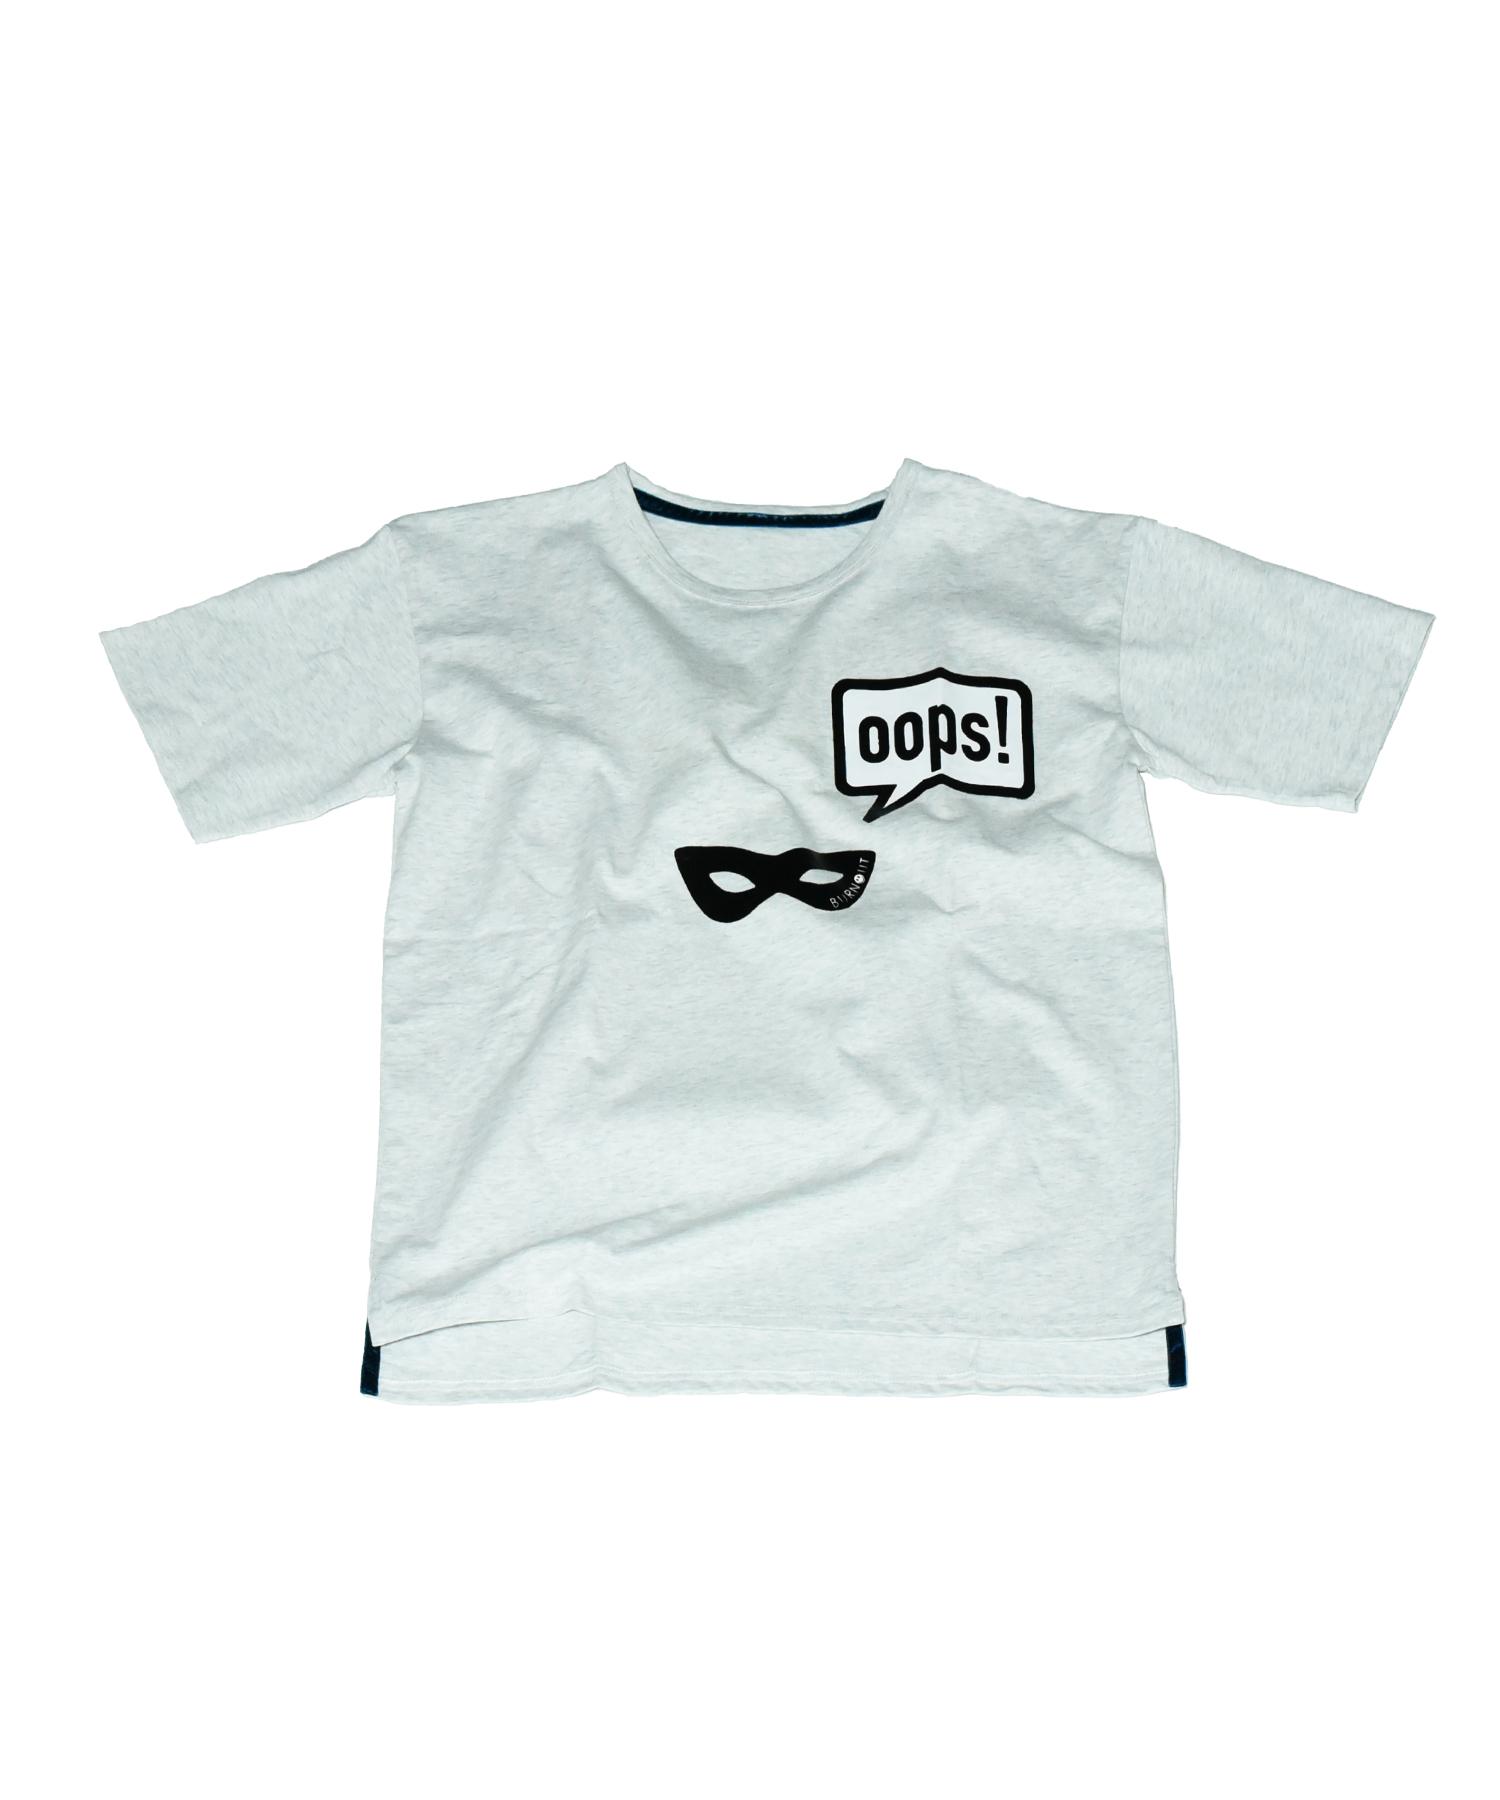 OOPS T-シャツ03